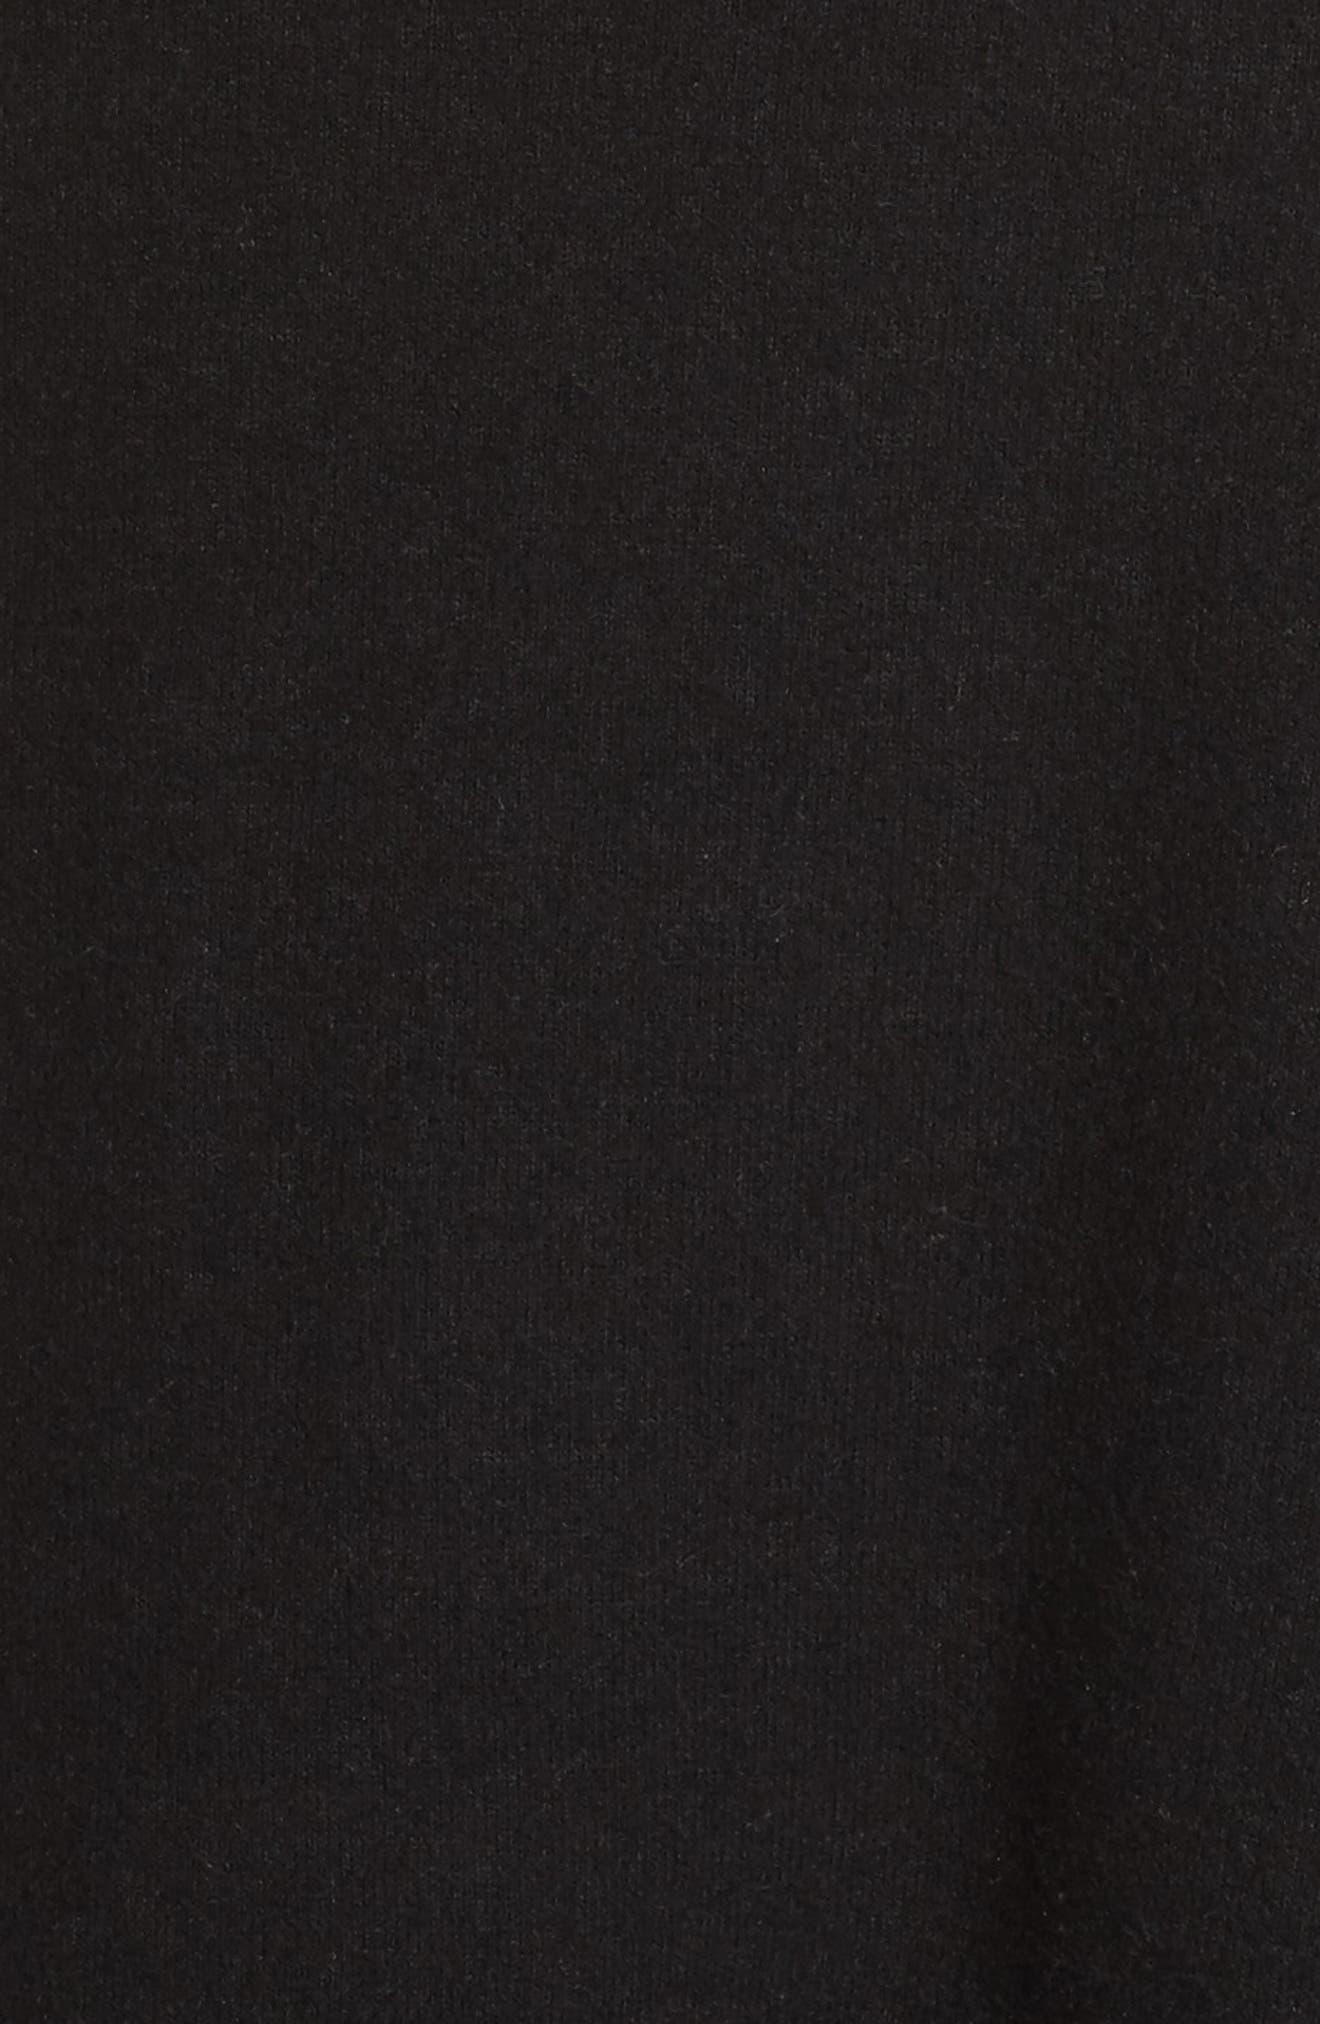 Convertible Neckline Cozy Tunic,                             Alternate thumbnail 21, color,